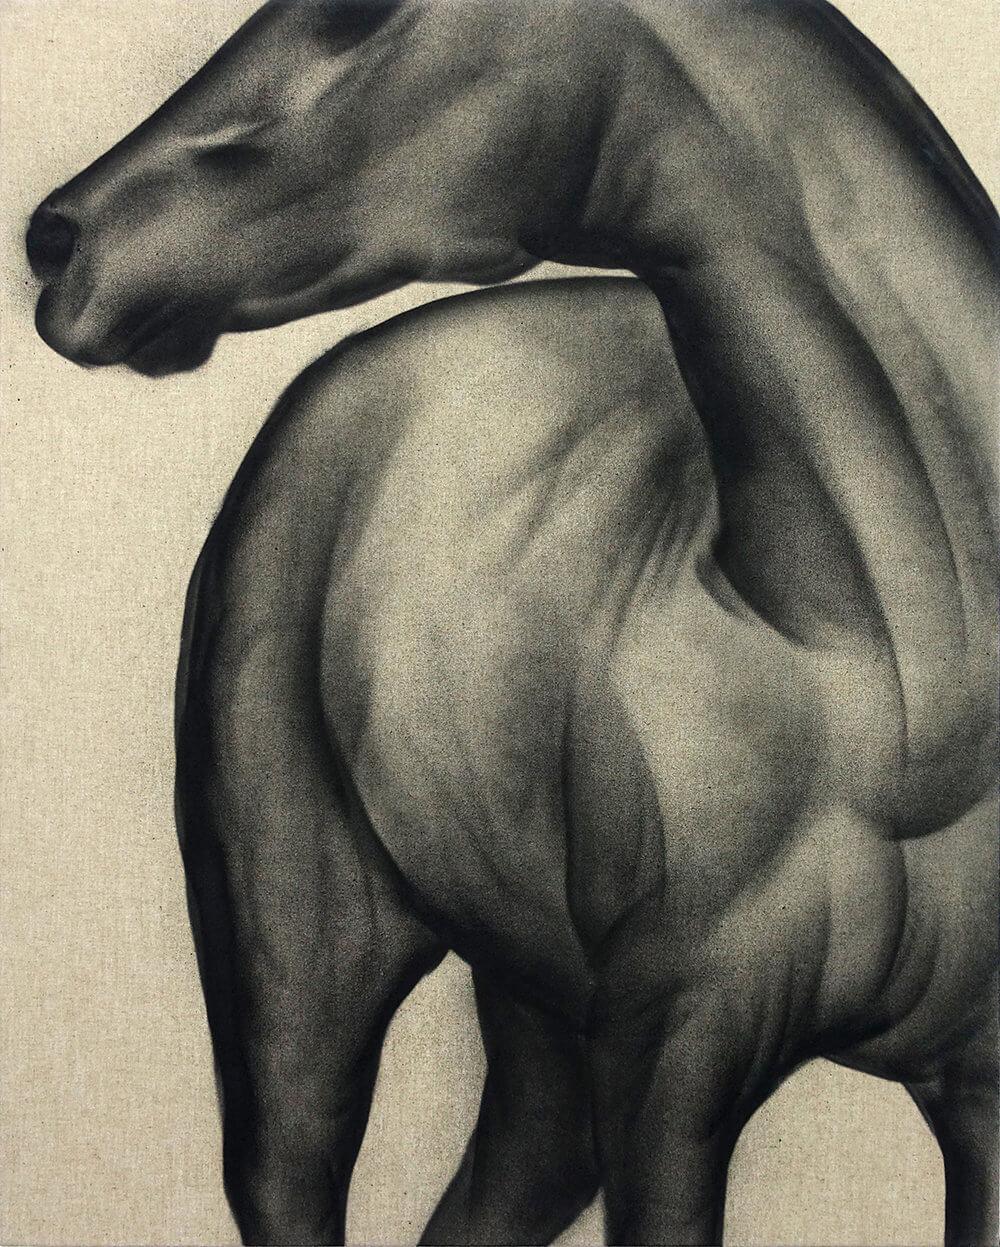 1617_Klone, Domestication of freedom, 2018, spray paint on canvas,100x80cm-ORIG_SIZE-1000x1247